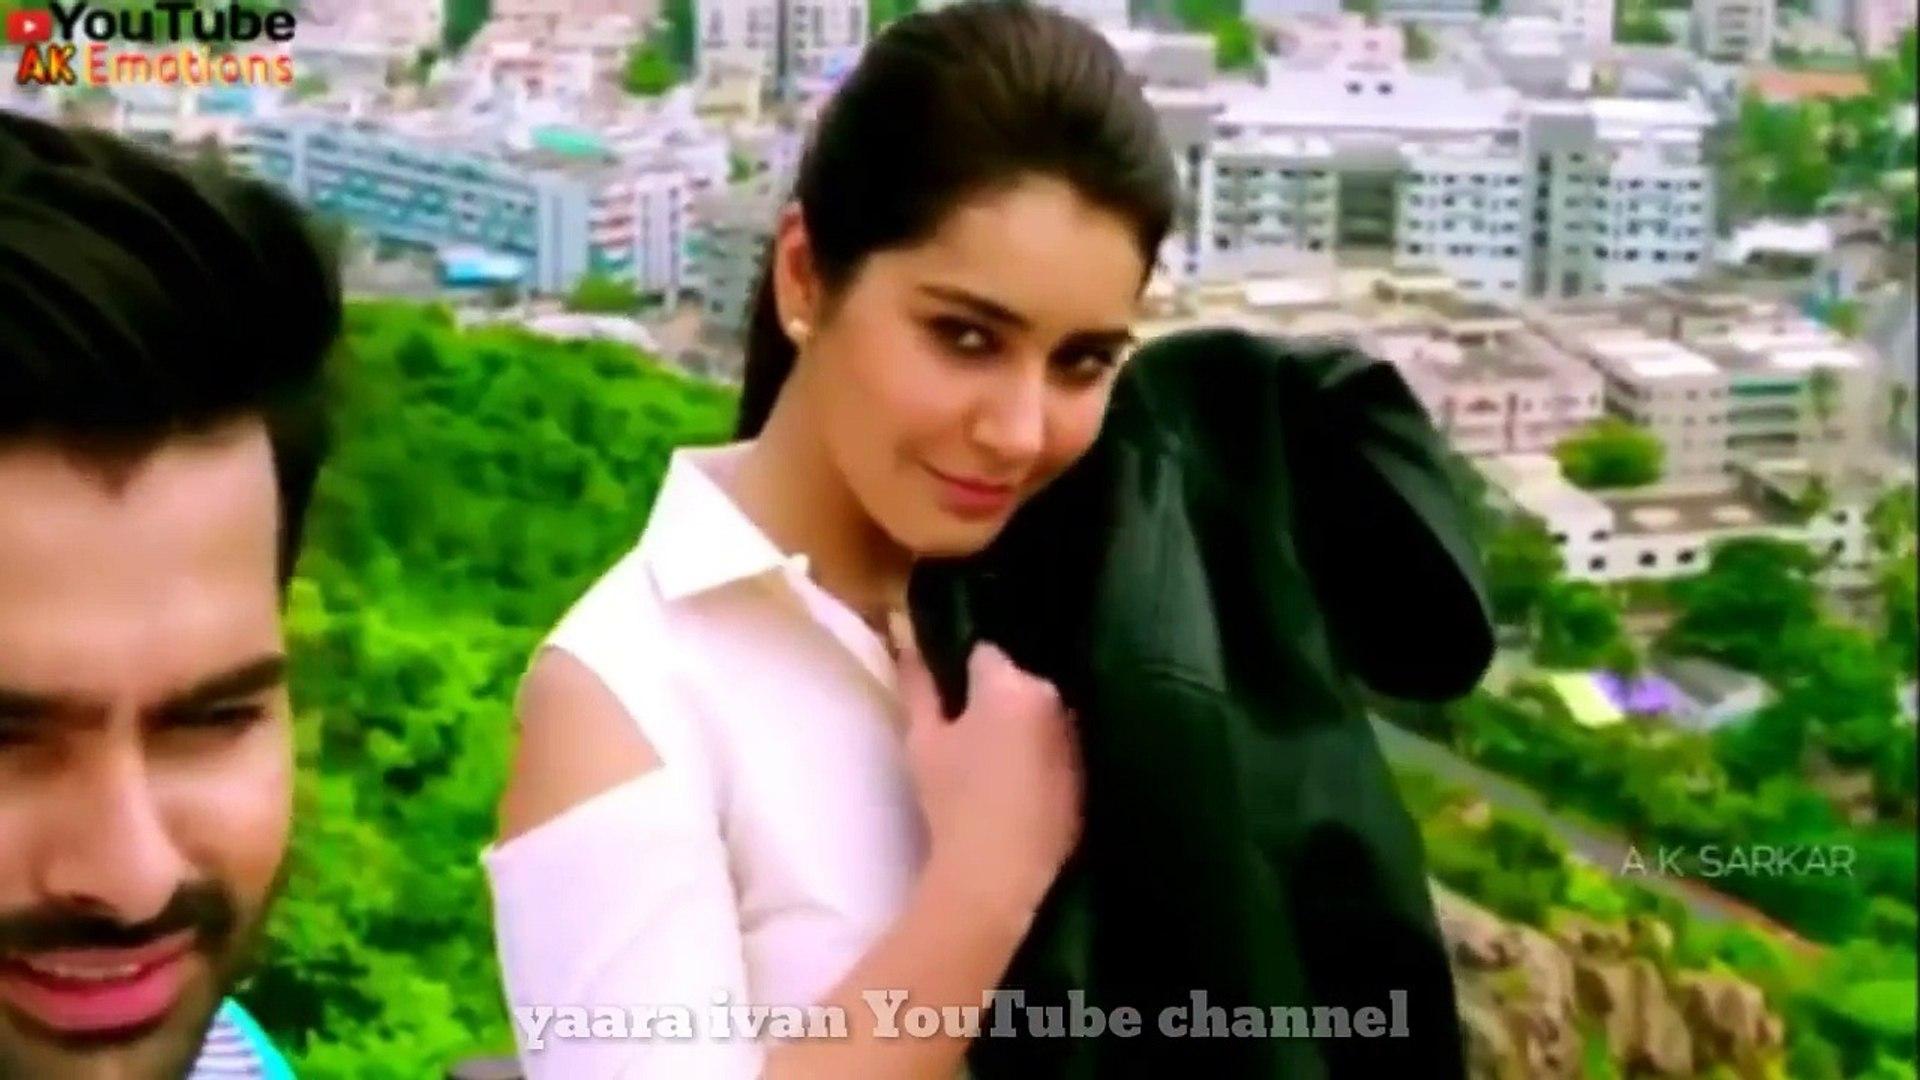 Tamil love whatsapp status ,WhatsApp status video song Tamil Very Romantic video must watch, Whatsap